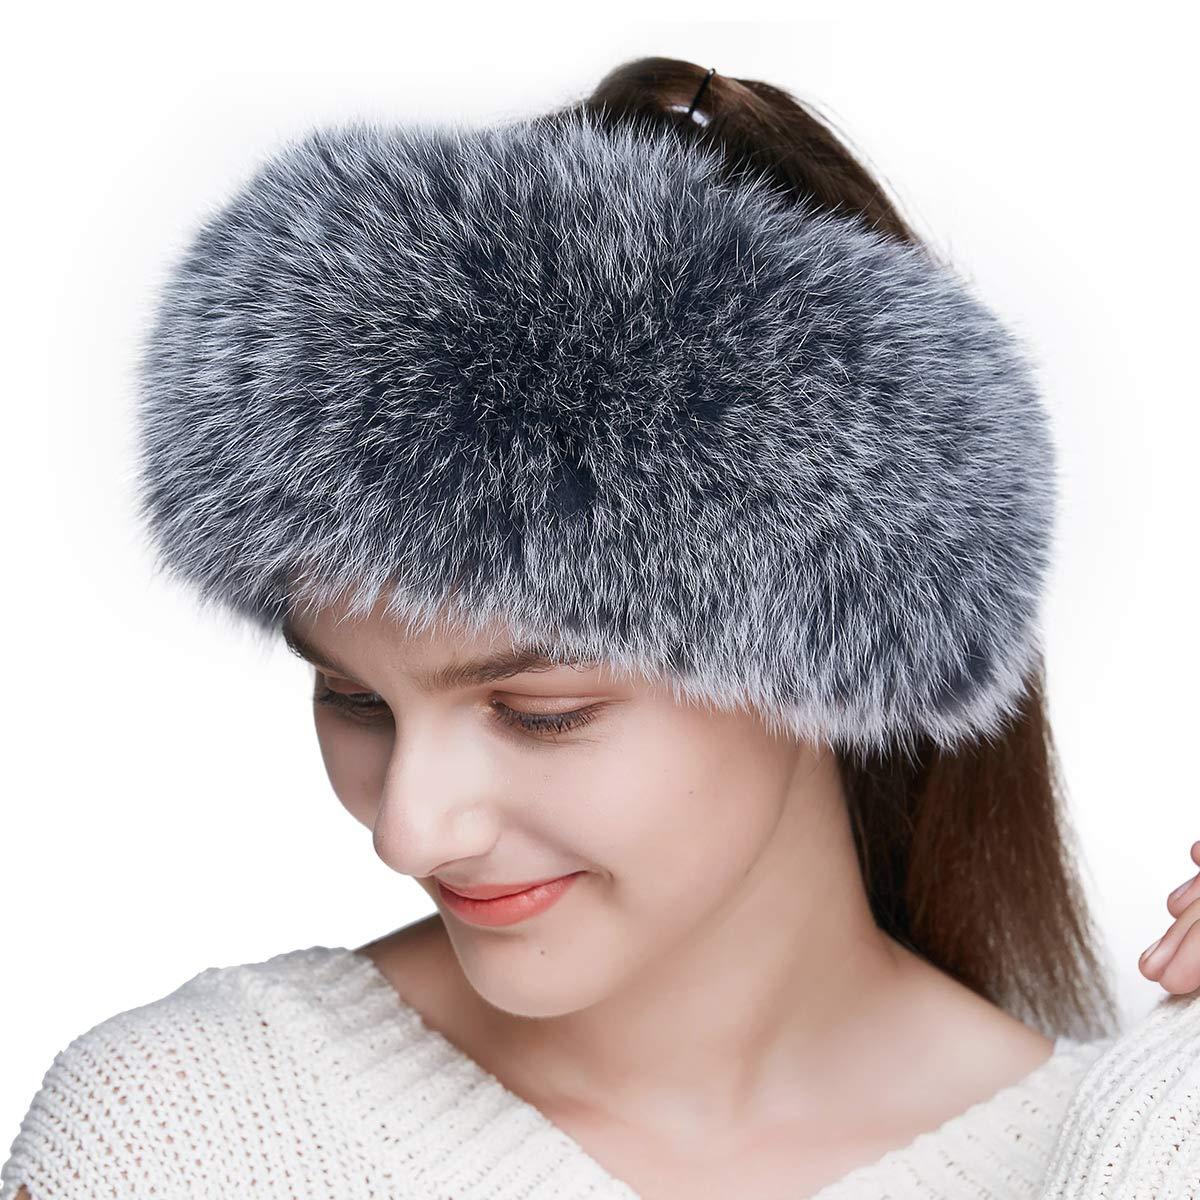 ENJOYFUR Women Headband Fox Fur Headband Winter Earwarmer Earmuff (Gray) by ENJOYFUR